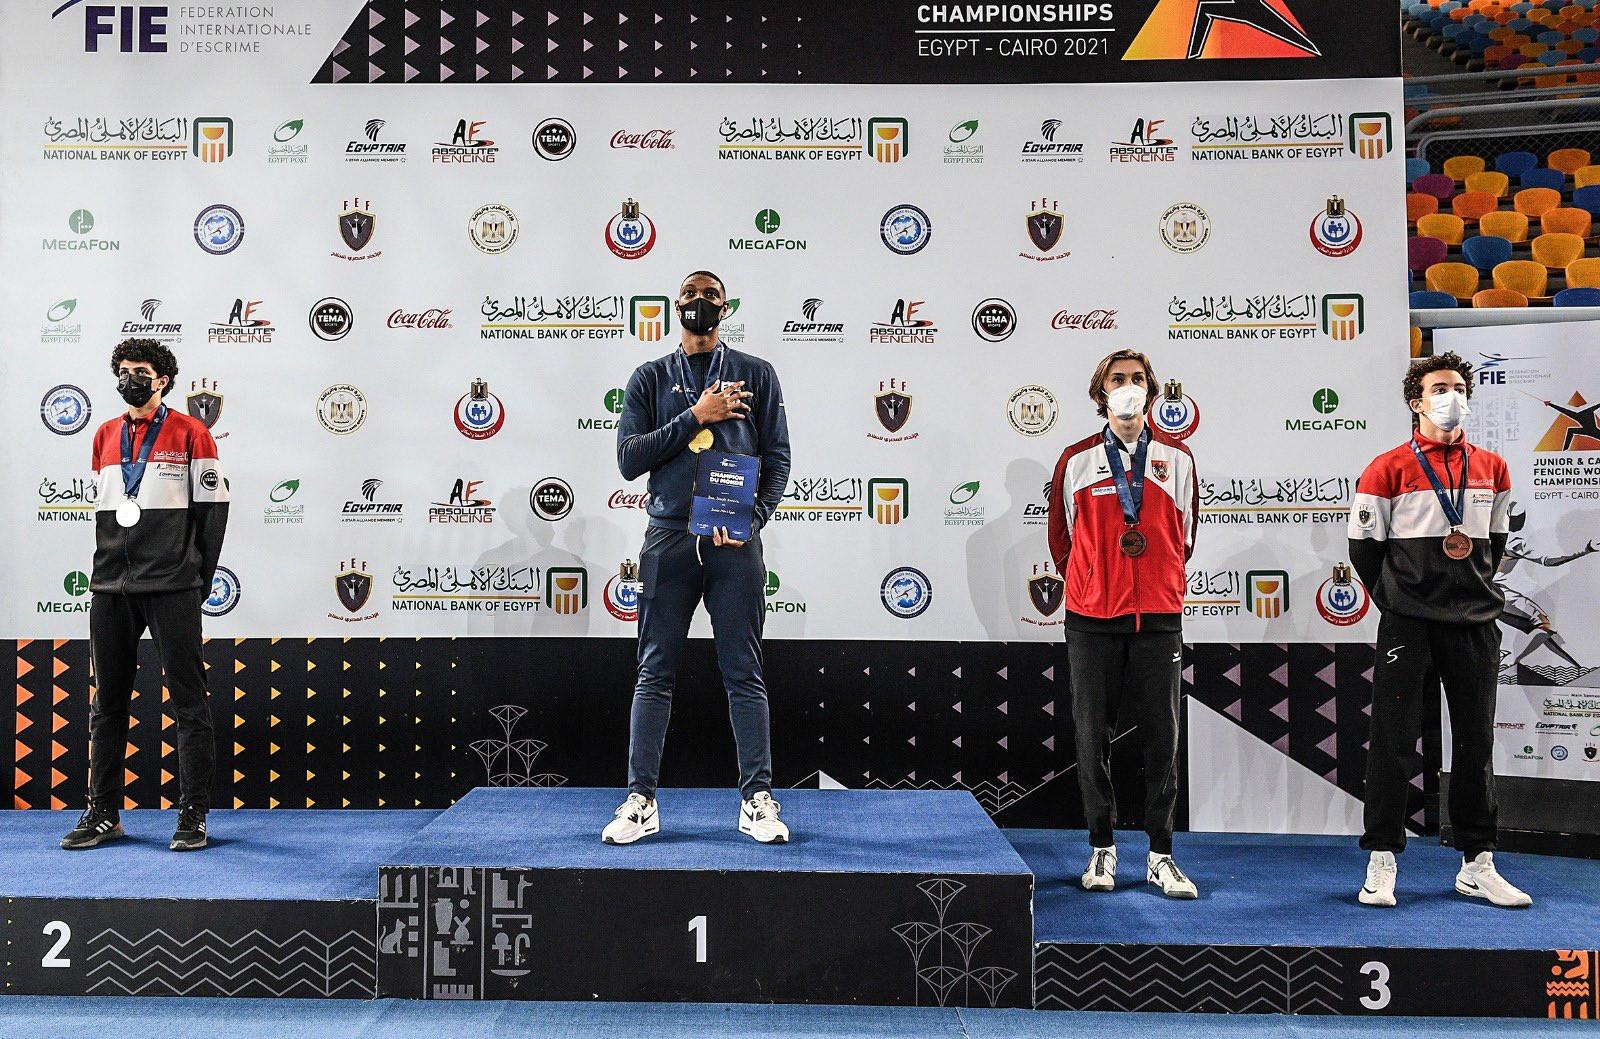 Kendrick Jean Joseph, centre, claimed the gold medal in the men's junior épée today ©Bizzi/FIE